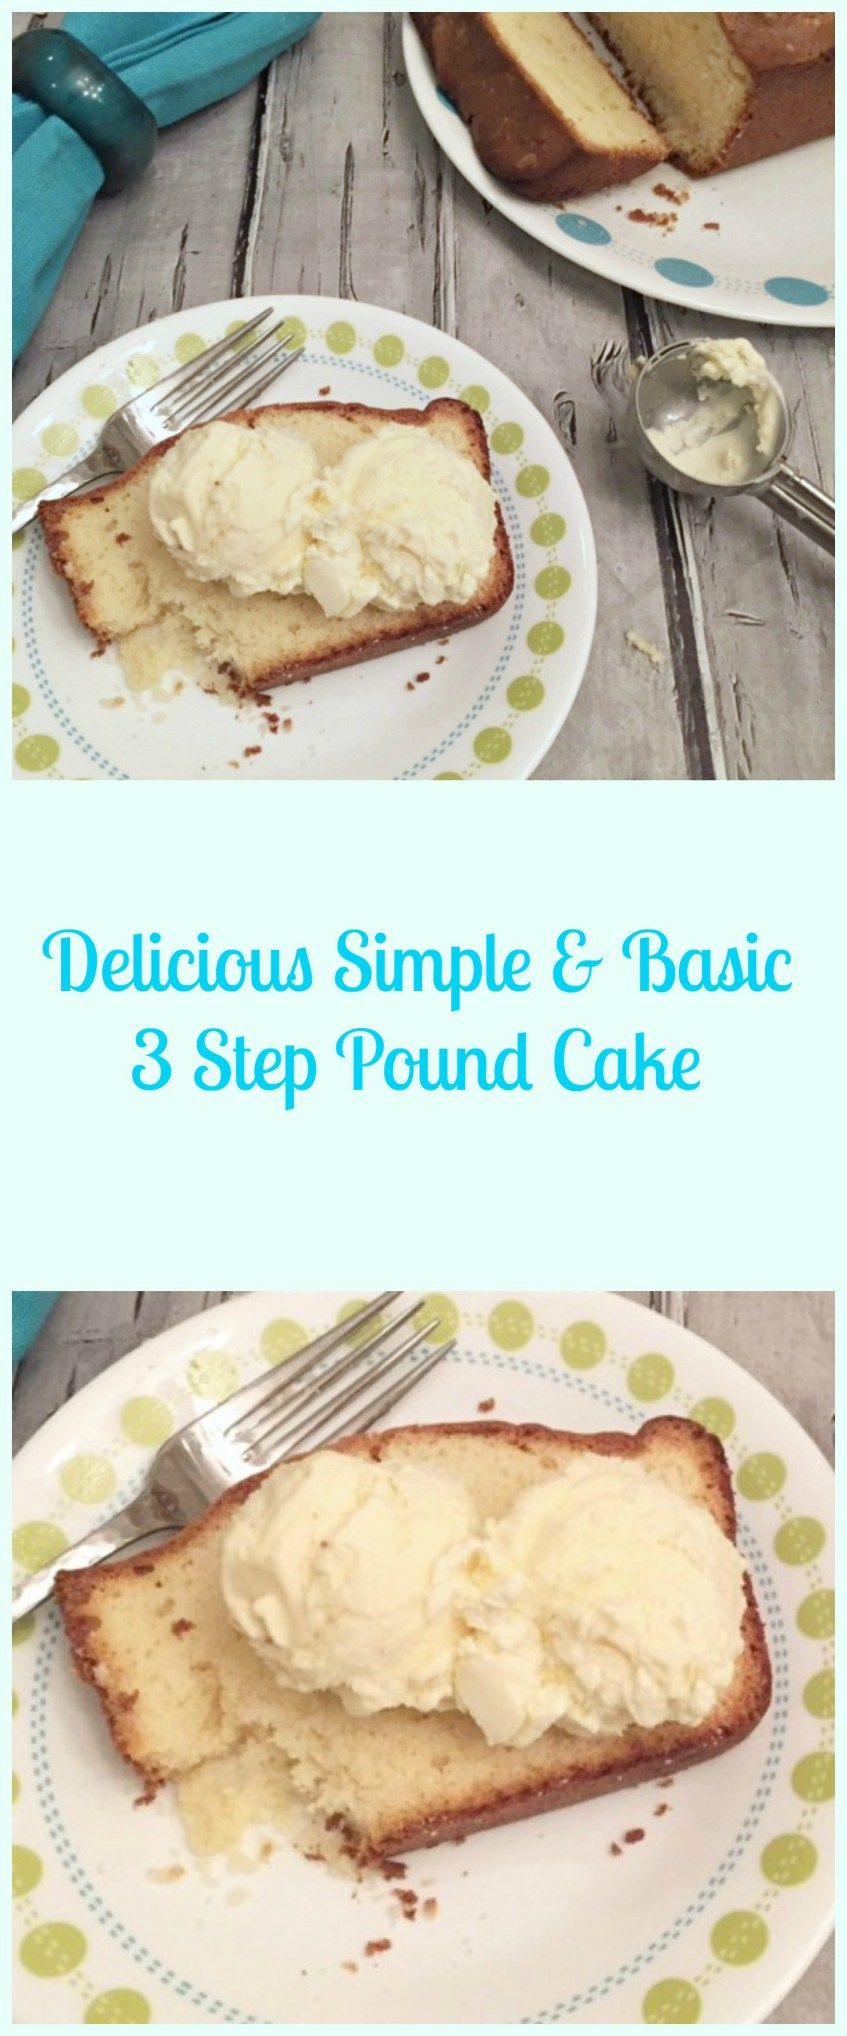 Best Basic 3 Step Pound Cake Recipe Dessert Recipes Easy Desserts Cake Recipes